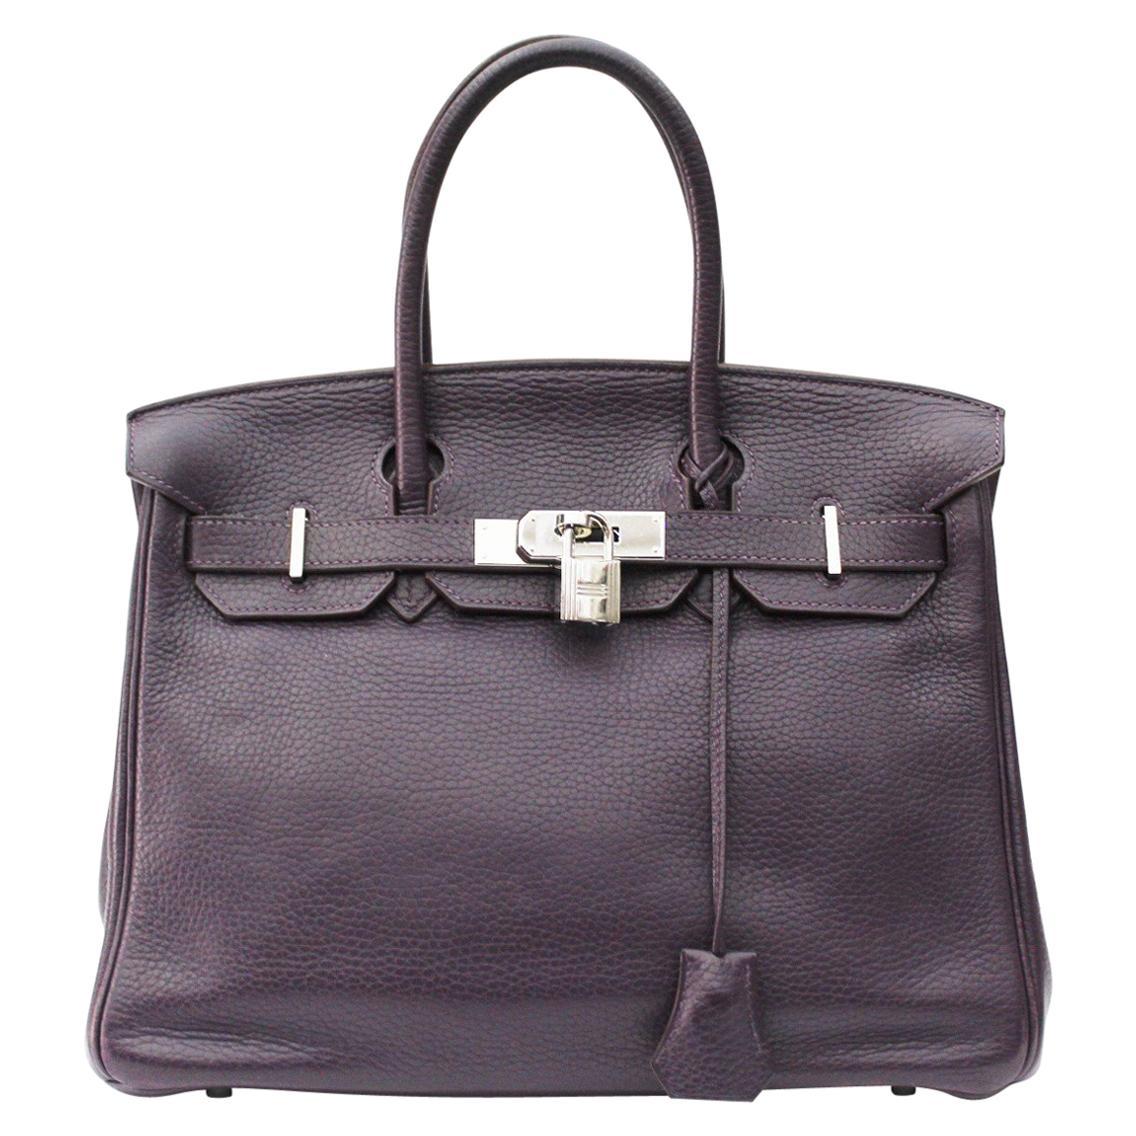 Hermes Togo Purple Leather Birkin 30 cm Bag